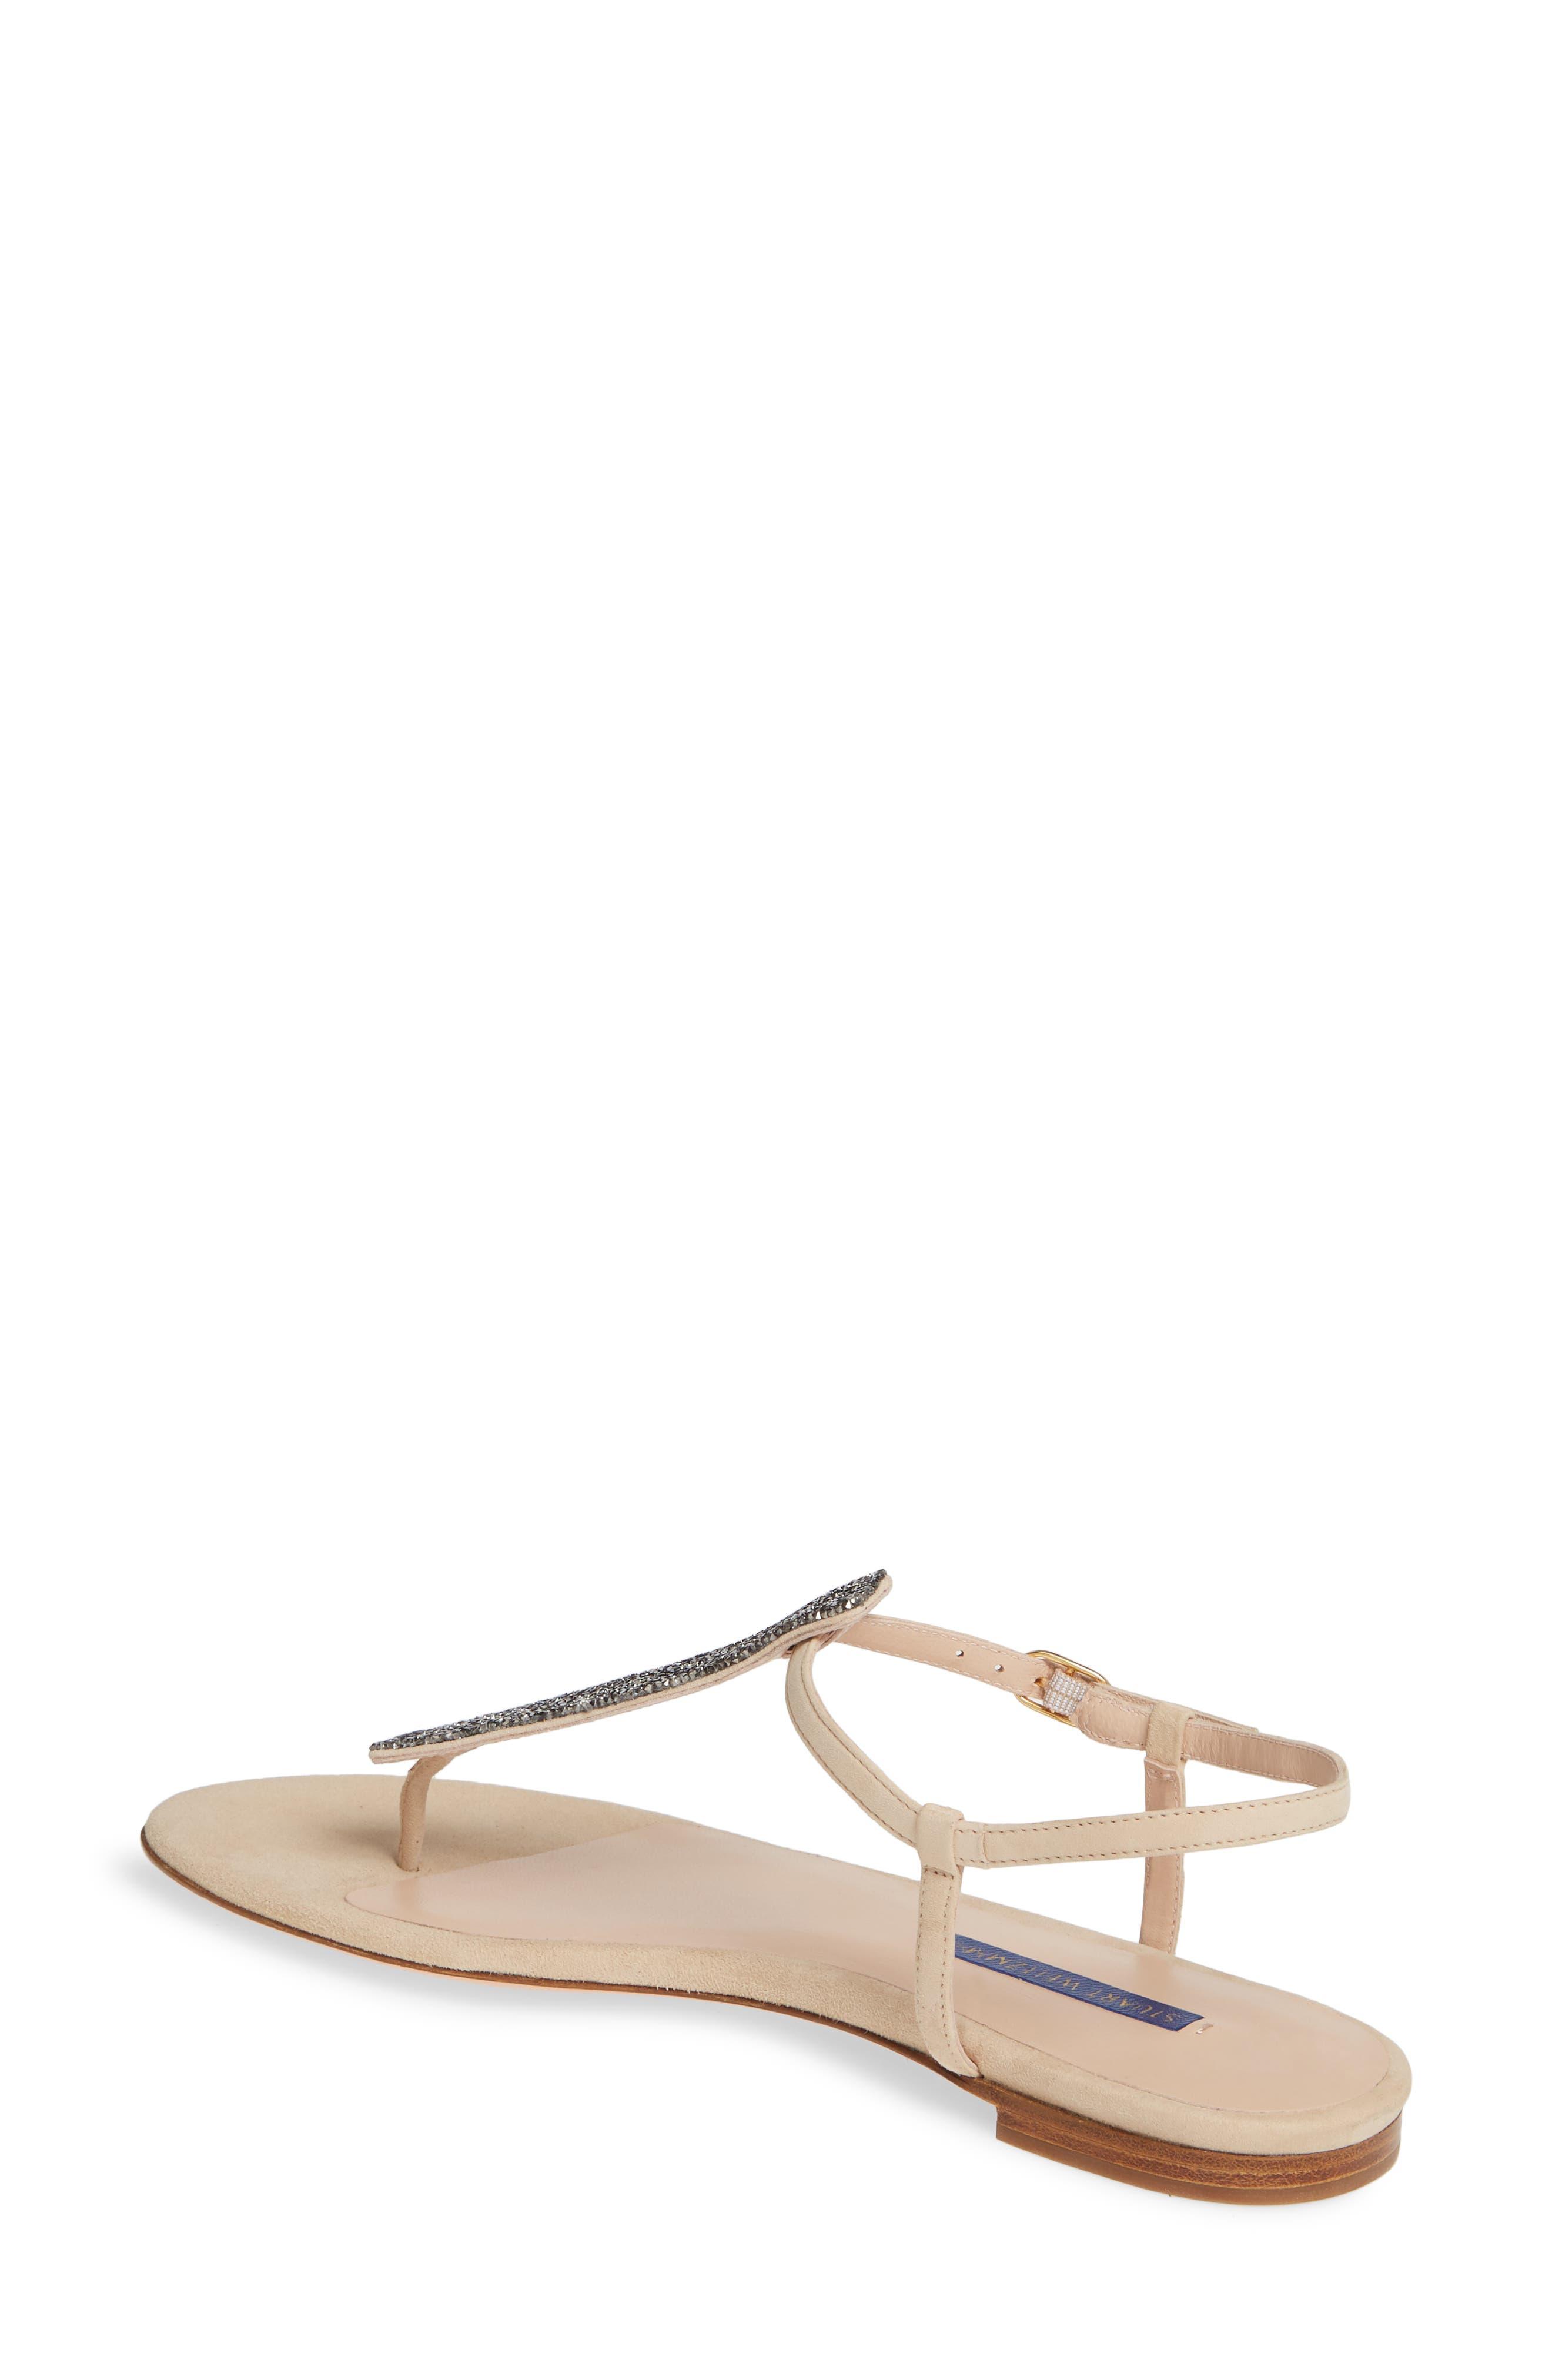 4b8df4483f2 Women s Stuart Weitzman Flat Heeled Sandals